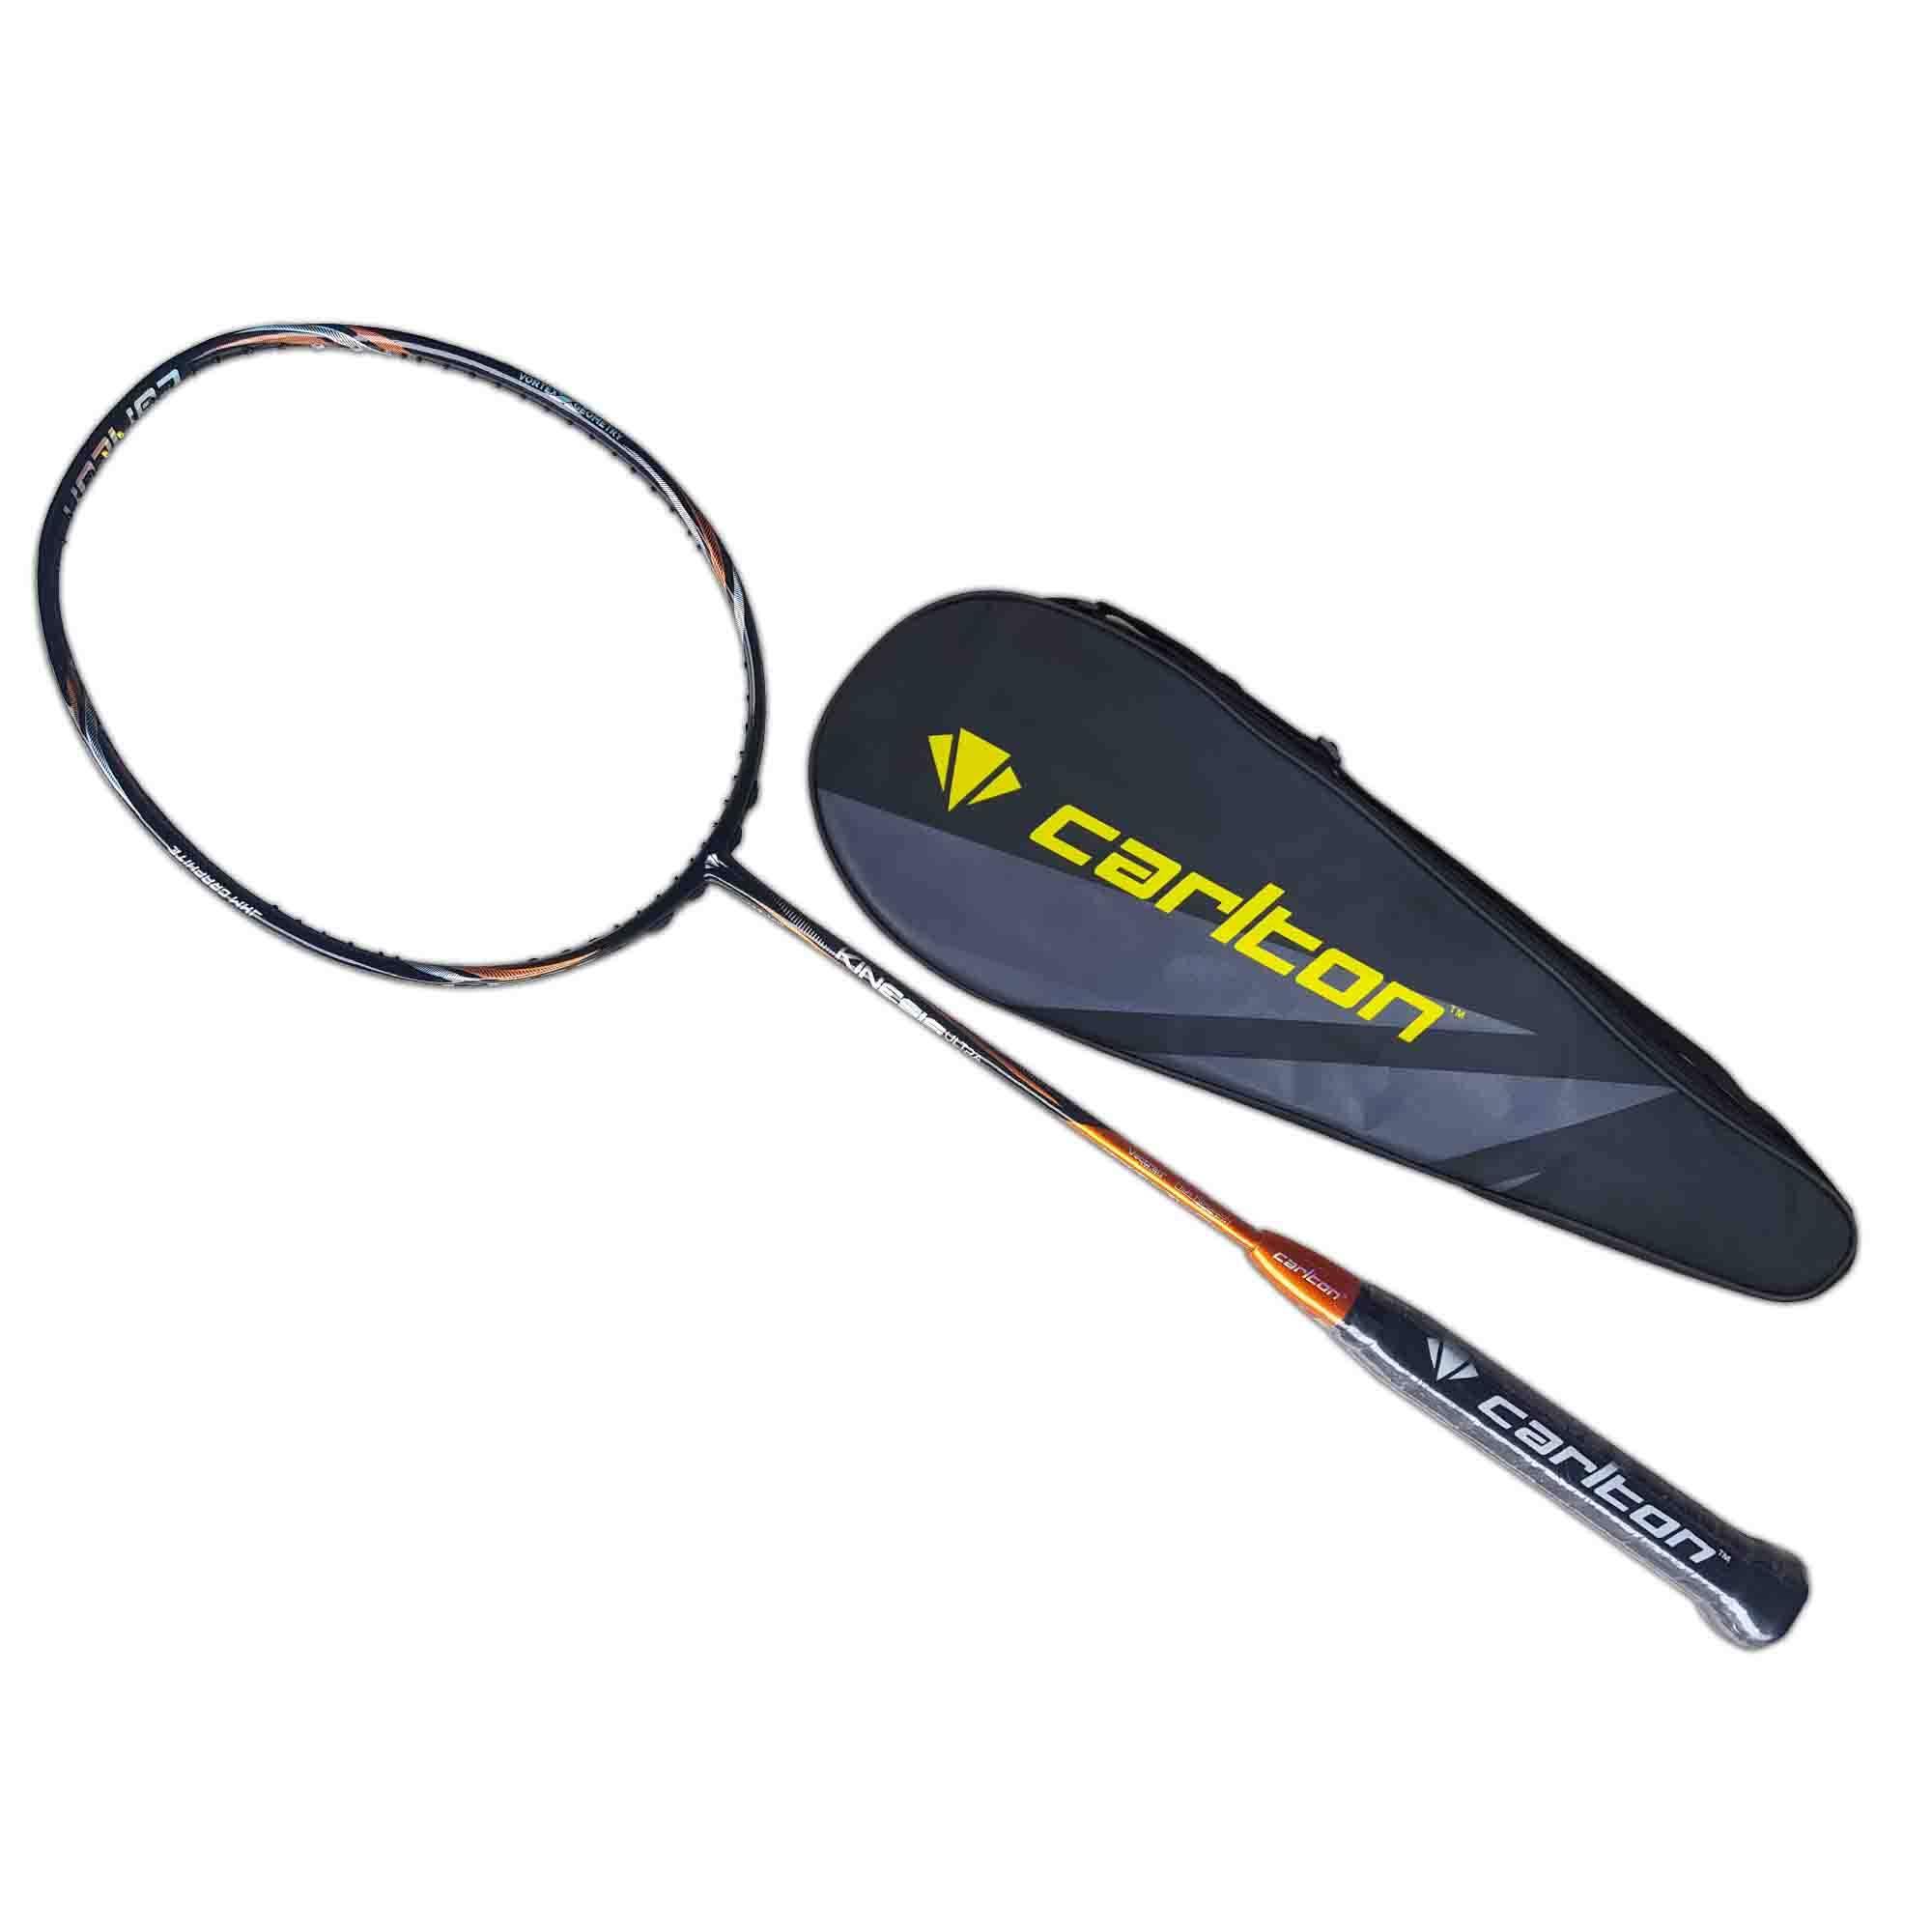 Carlton Badminton Racket Kinesis Ultra Pro 4U